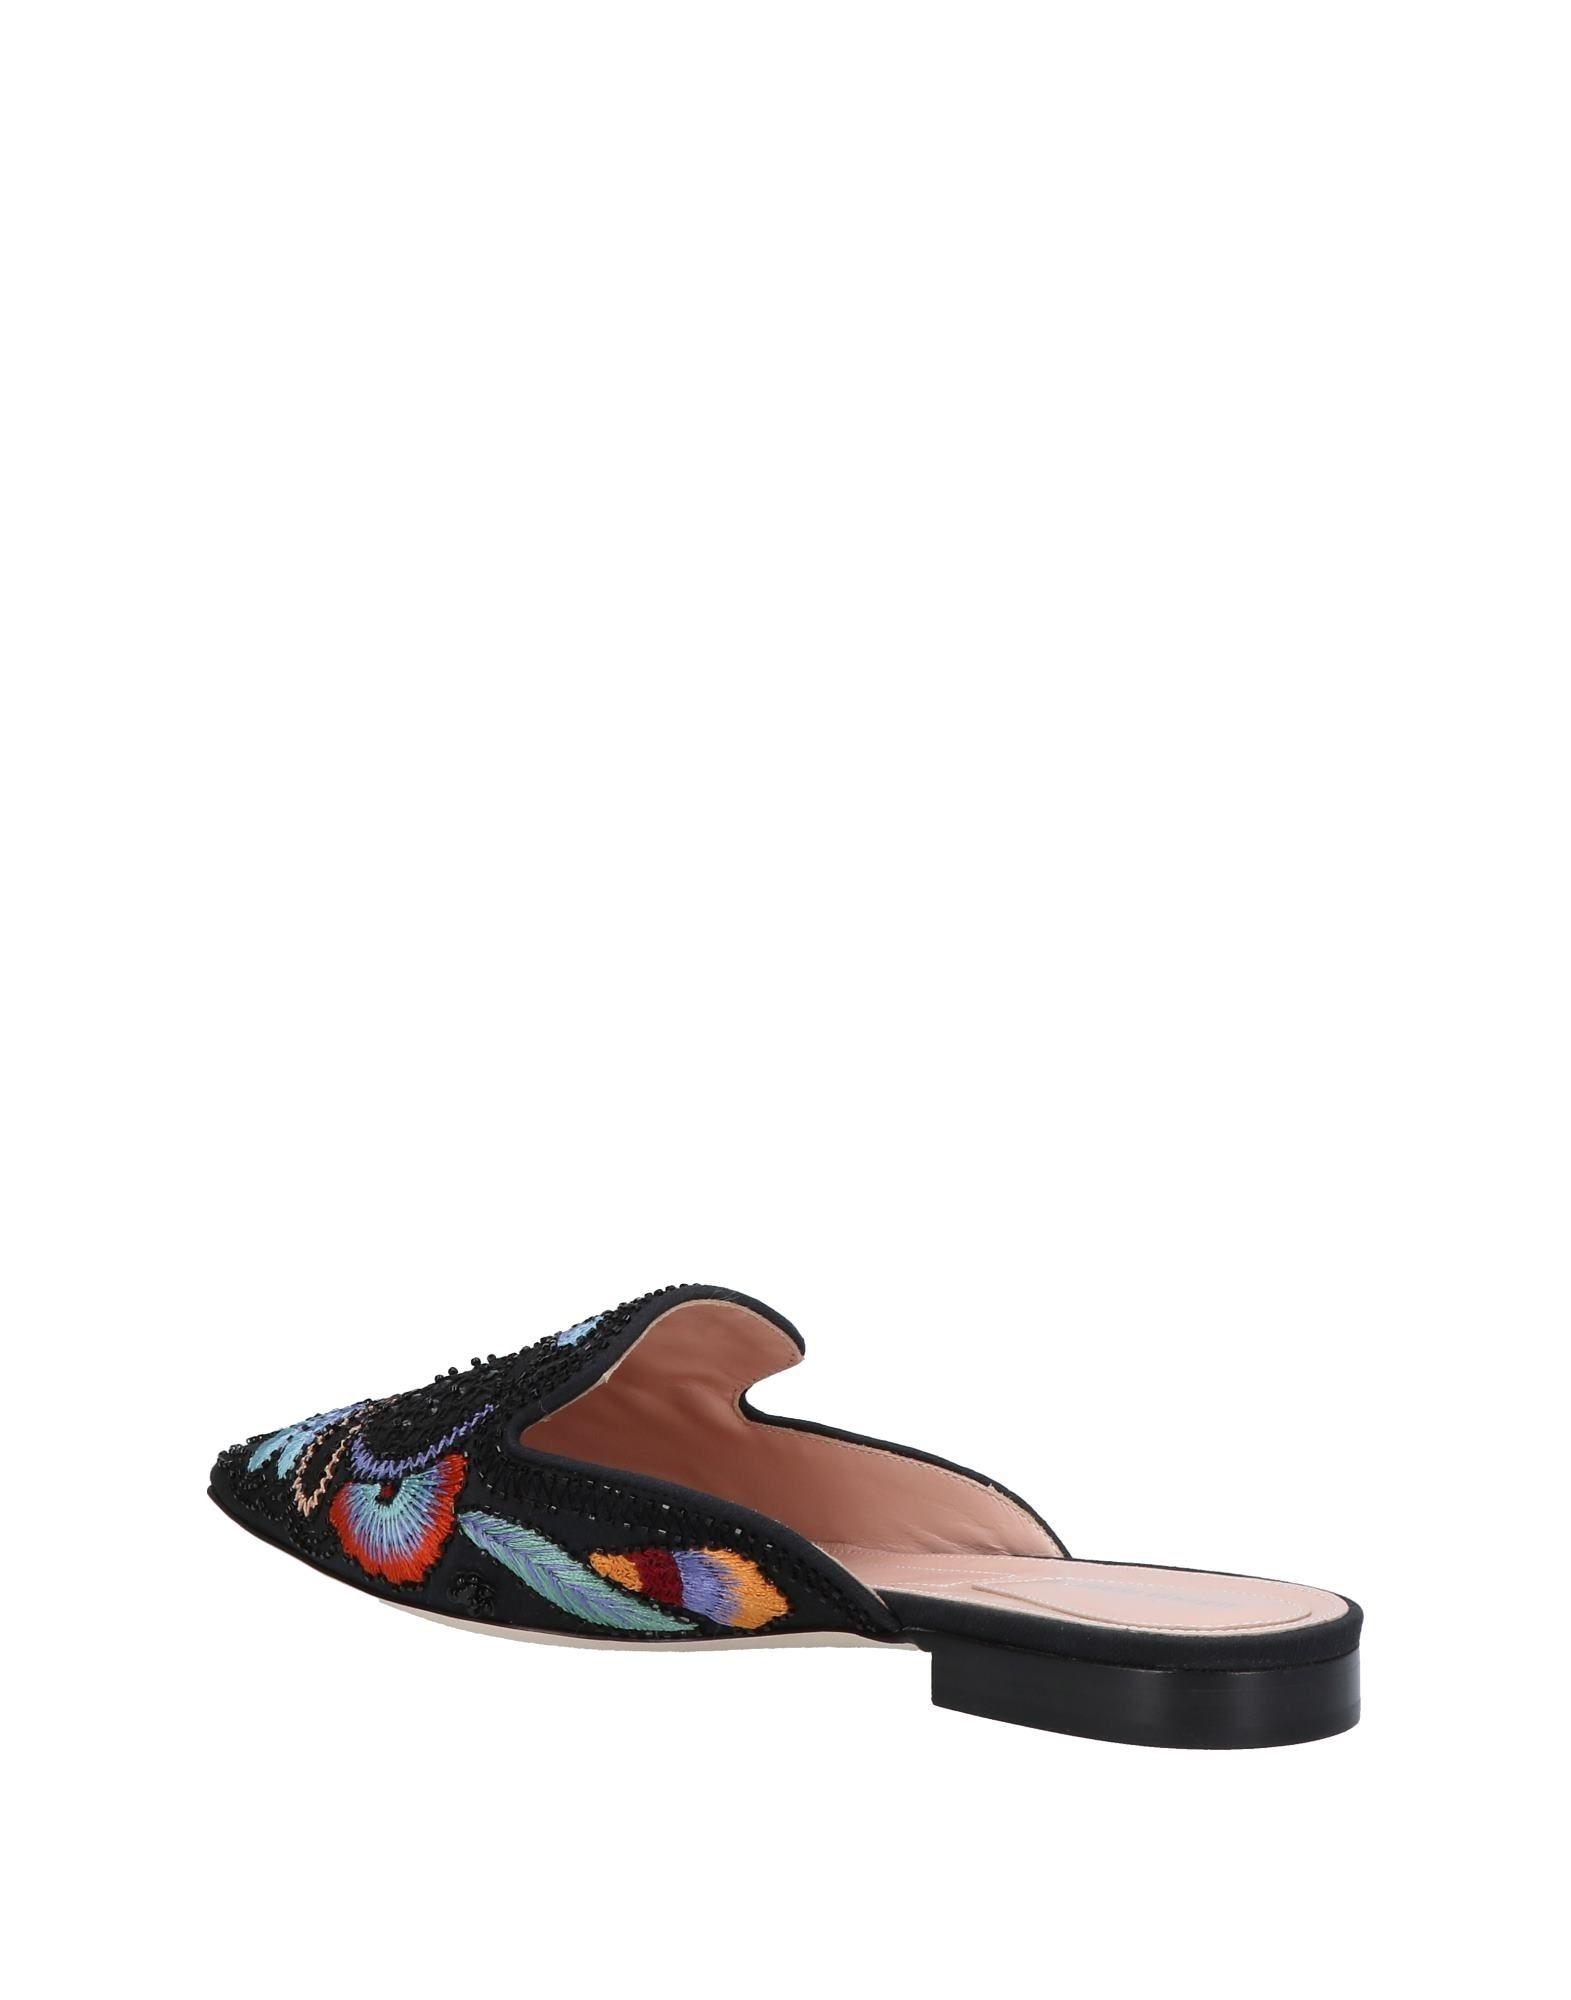 Alberta Ferretti Pantoletten Damen Schuhe  11435001QMGünstige gut aussehende Schuhe Damen 190c3b